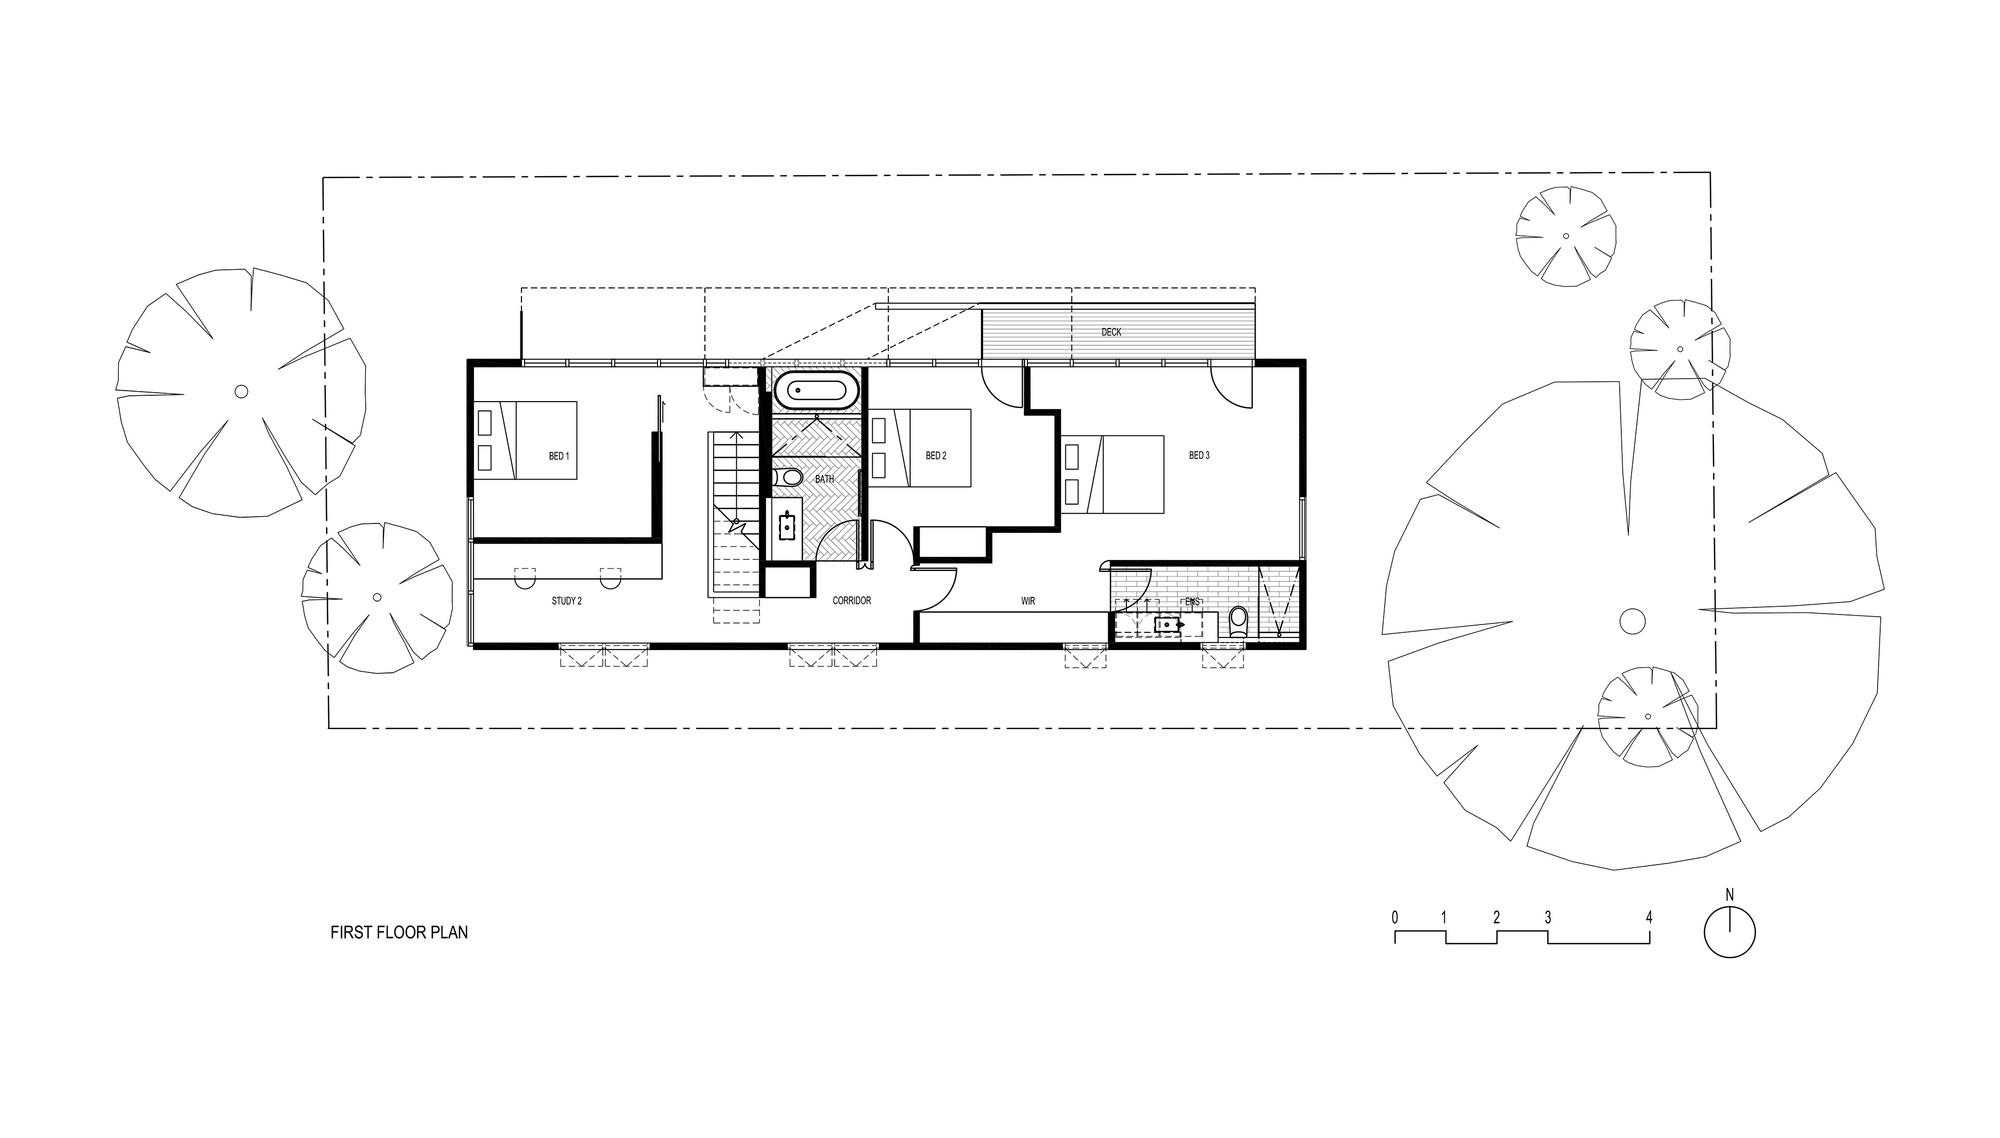 Casa para bicicletas fmd architects plataforma for Floor plan holder